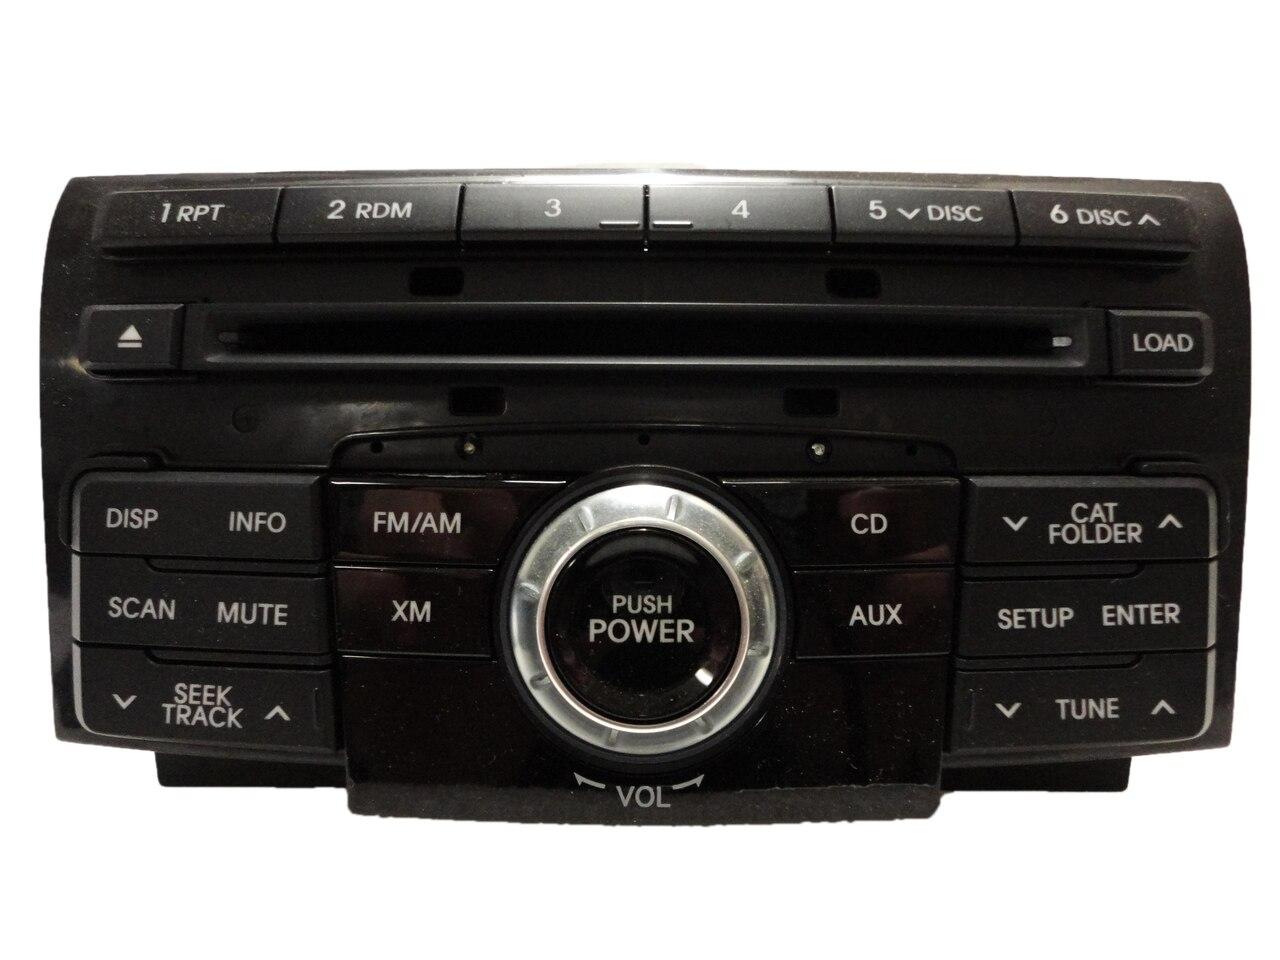 Stereo Wiring Diagram For 2001 Hyundai Sonata